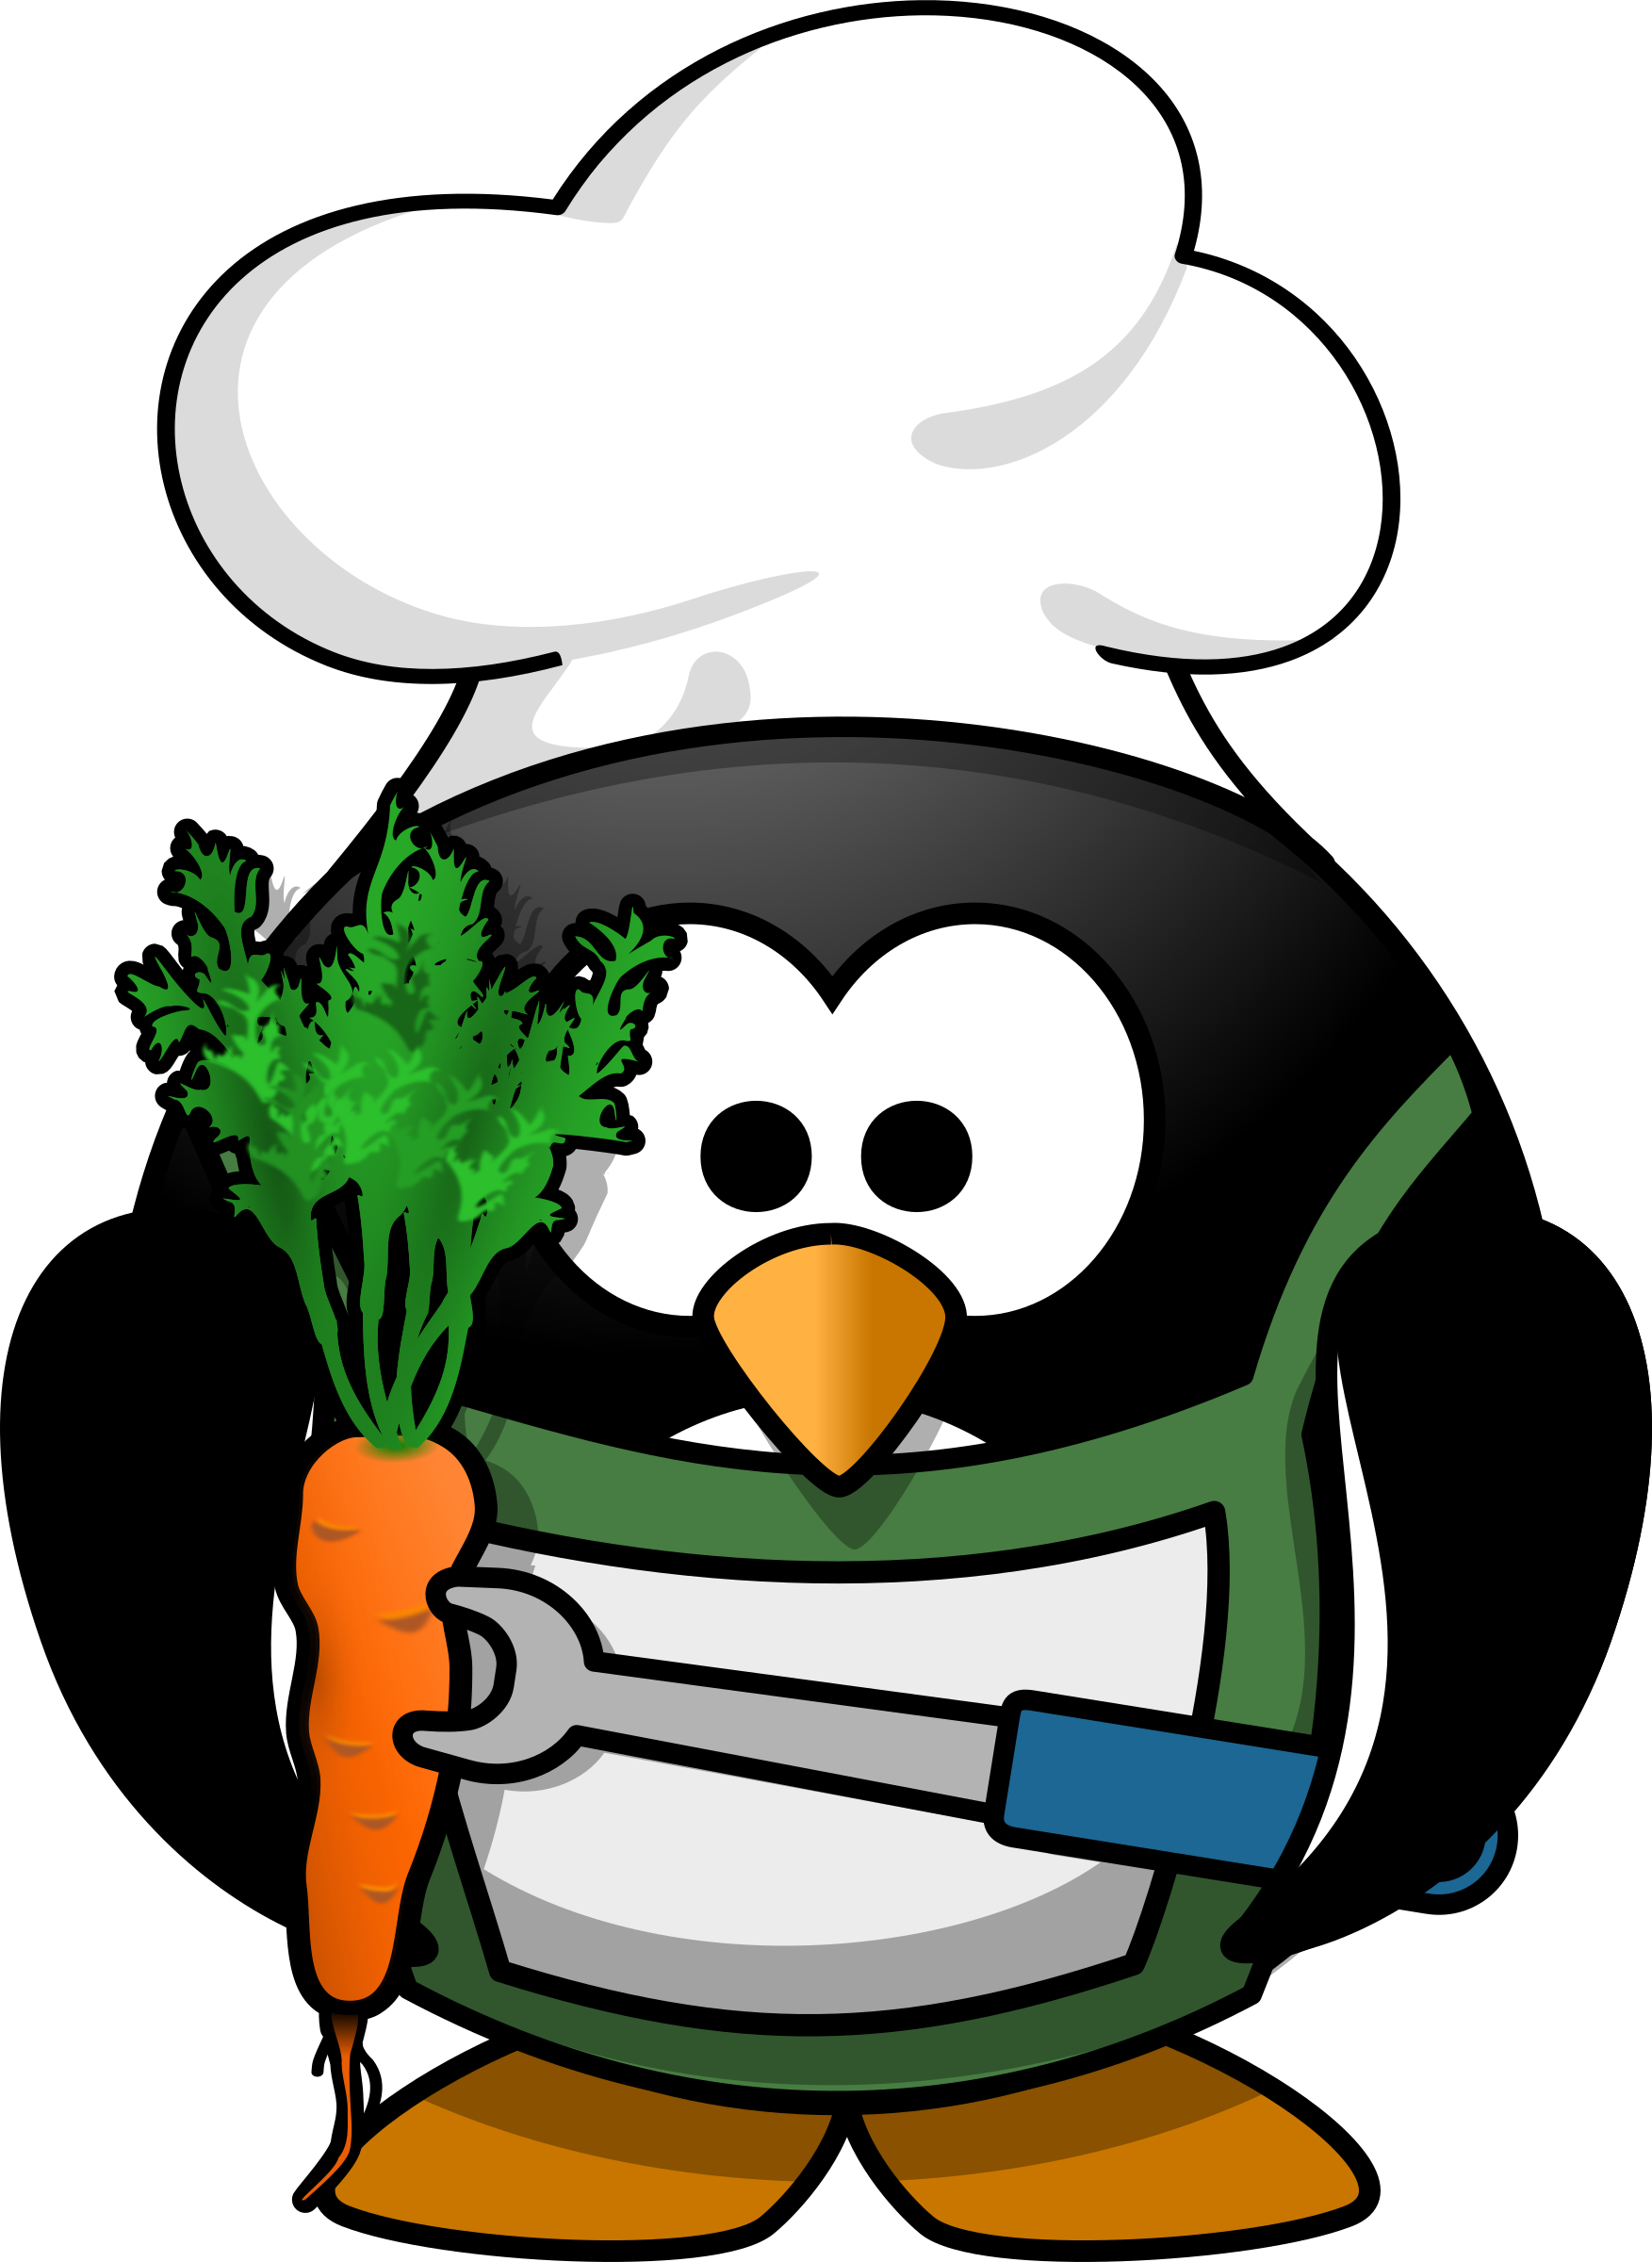 School cook clipart banner free Clipart - Veggie-Penguin banner free